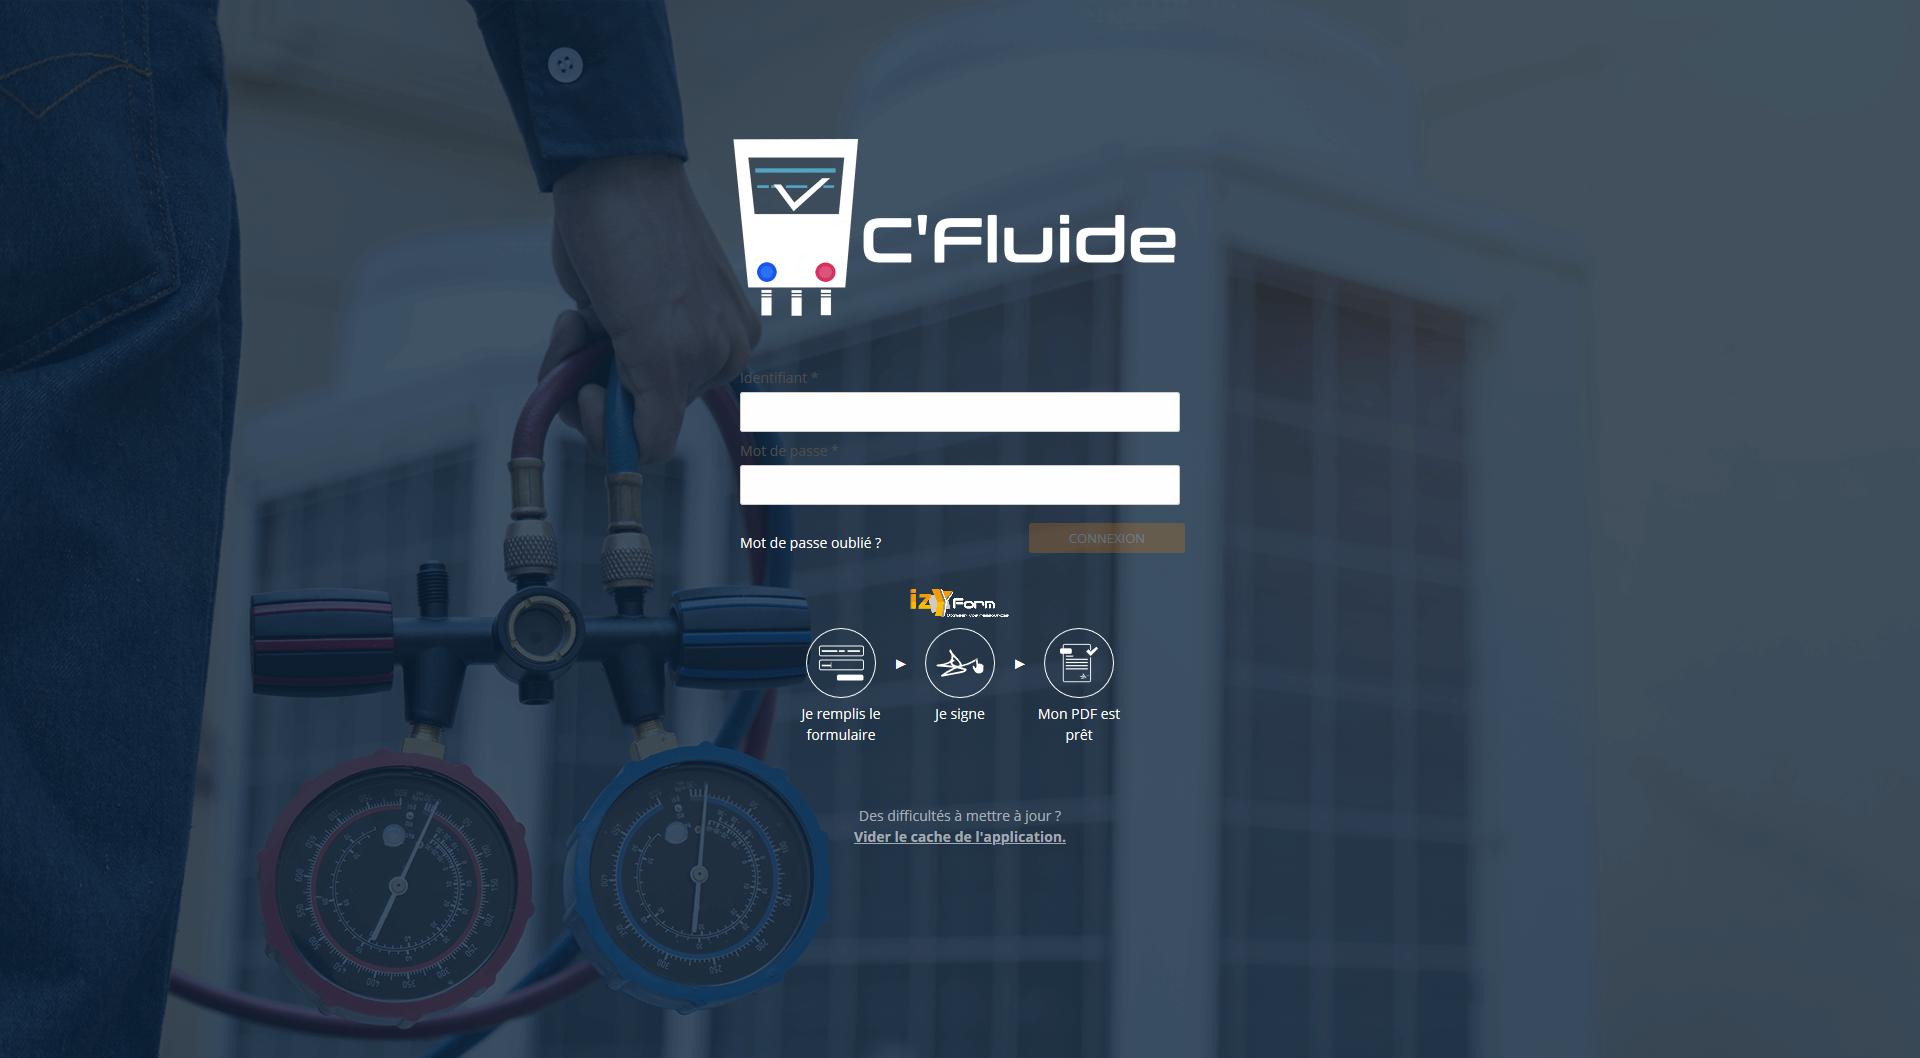 CFluide_Home-FO